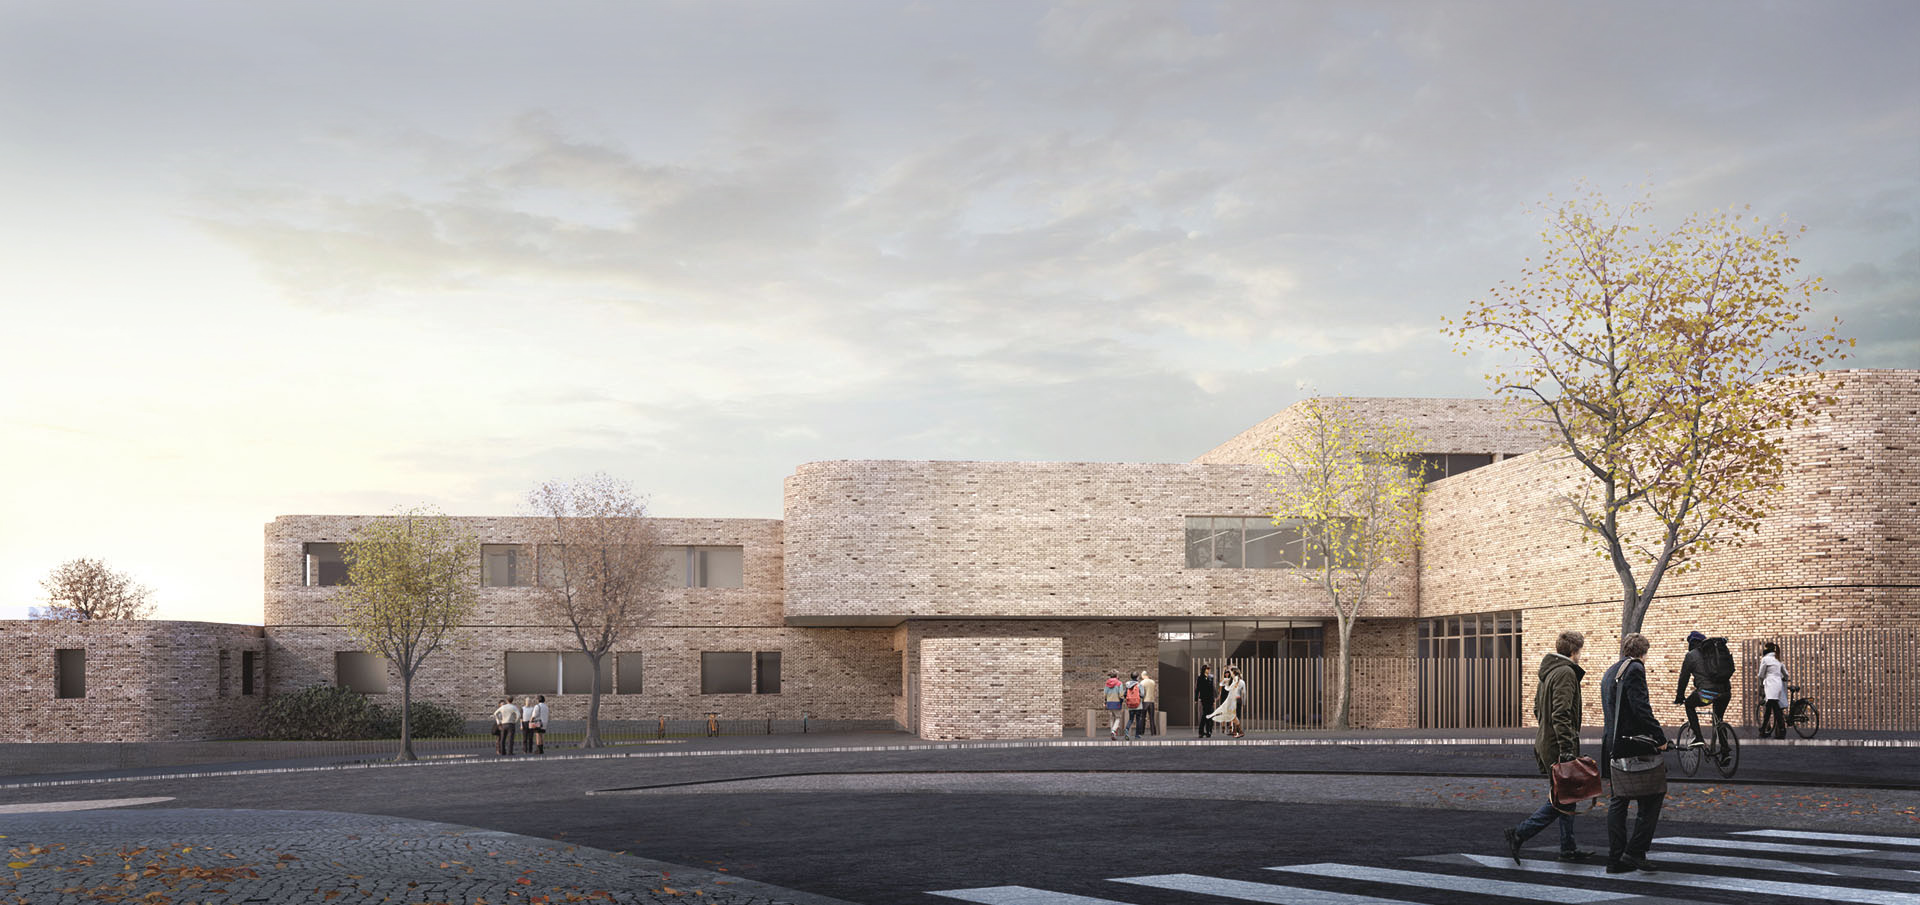 sastudio tiago sá architecture arquitetura cascais school